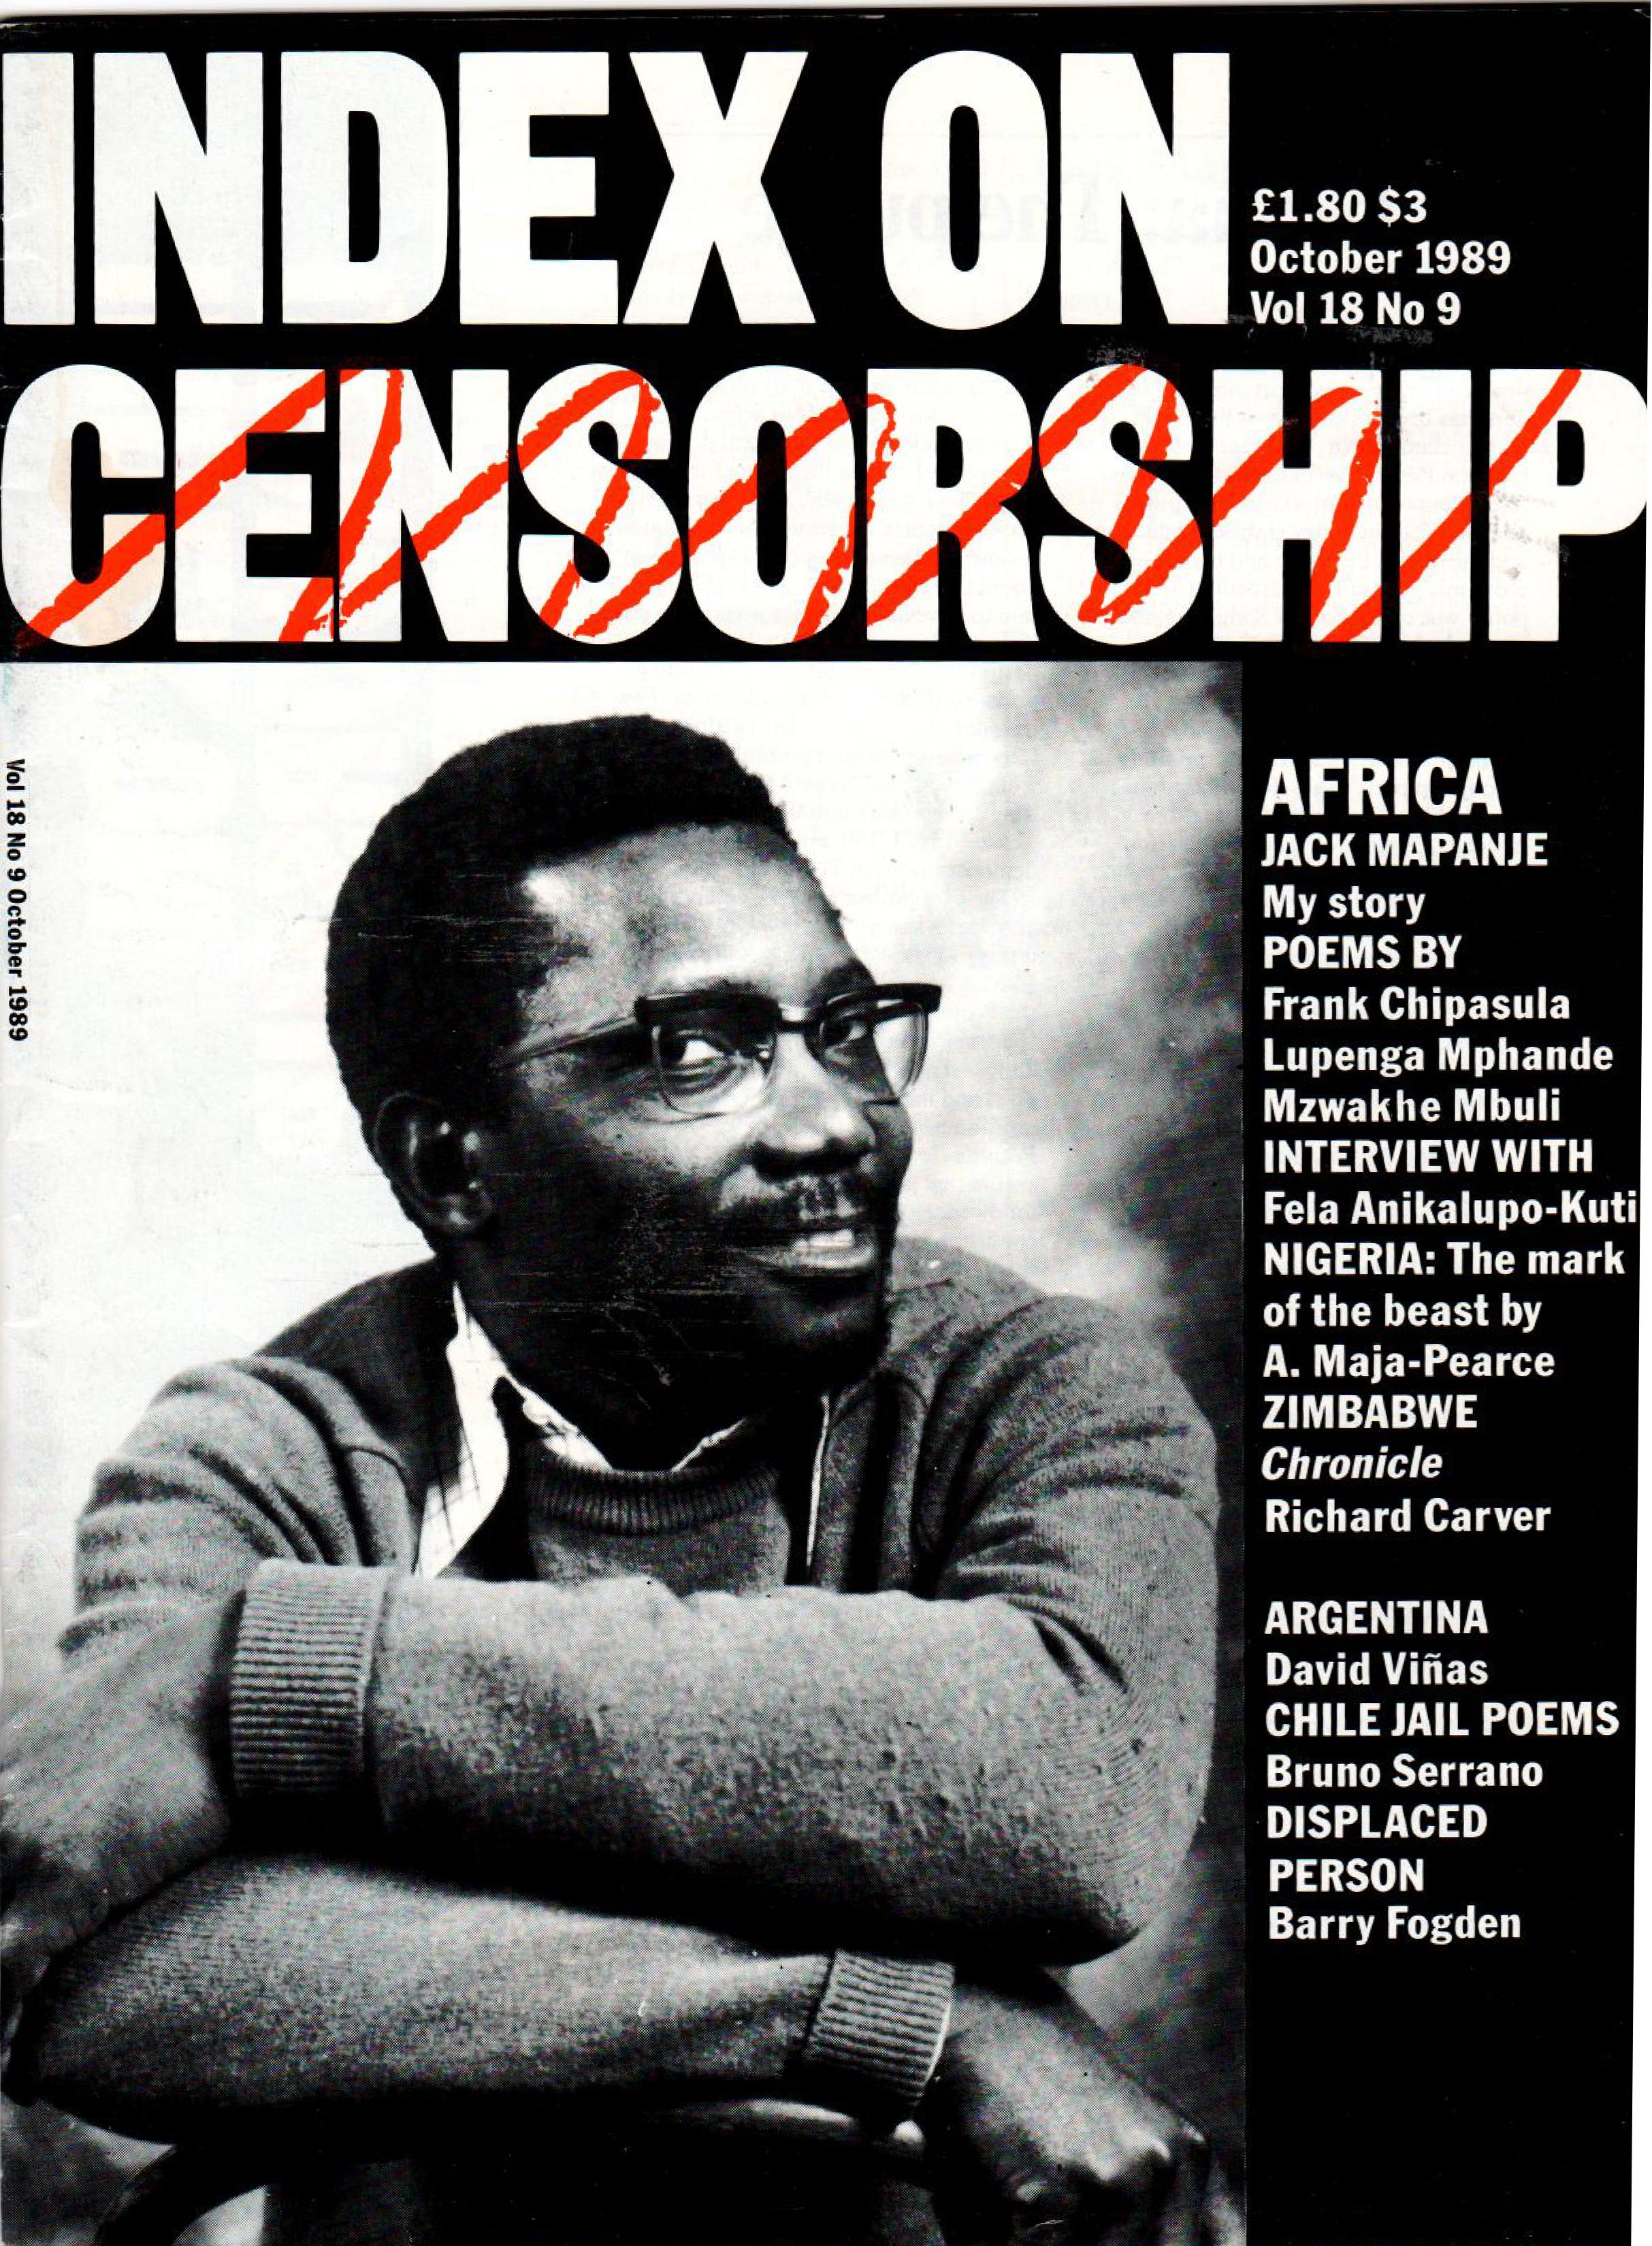 jack mapanje as an imbongi افریقی ادب کی تاریخ بہت پرانی ہے، لیکن چونکہ افریقہ جدید تہذیب و تمدن کی روشنی سے دور ایک.